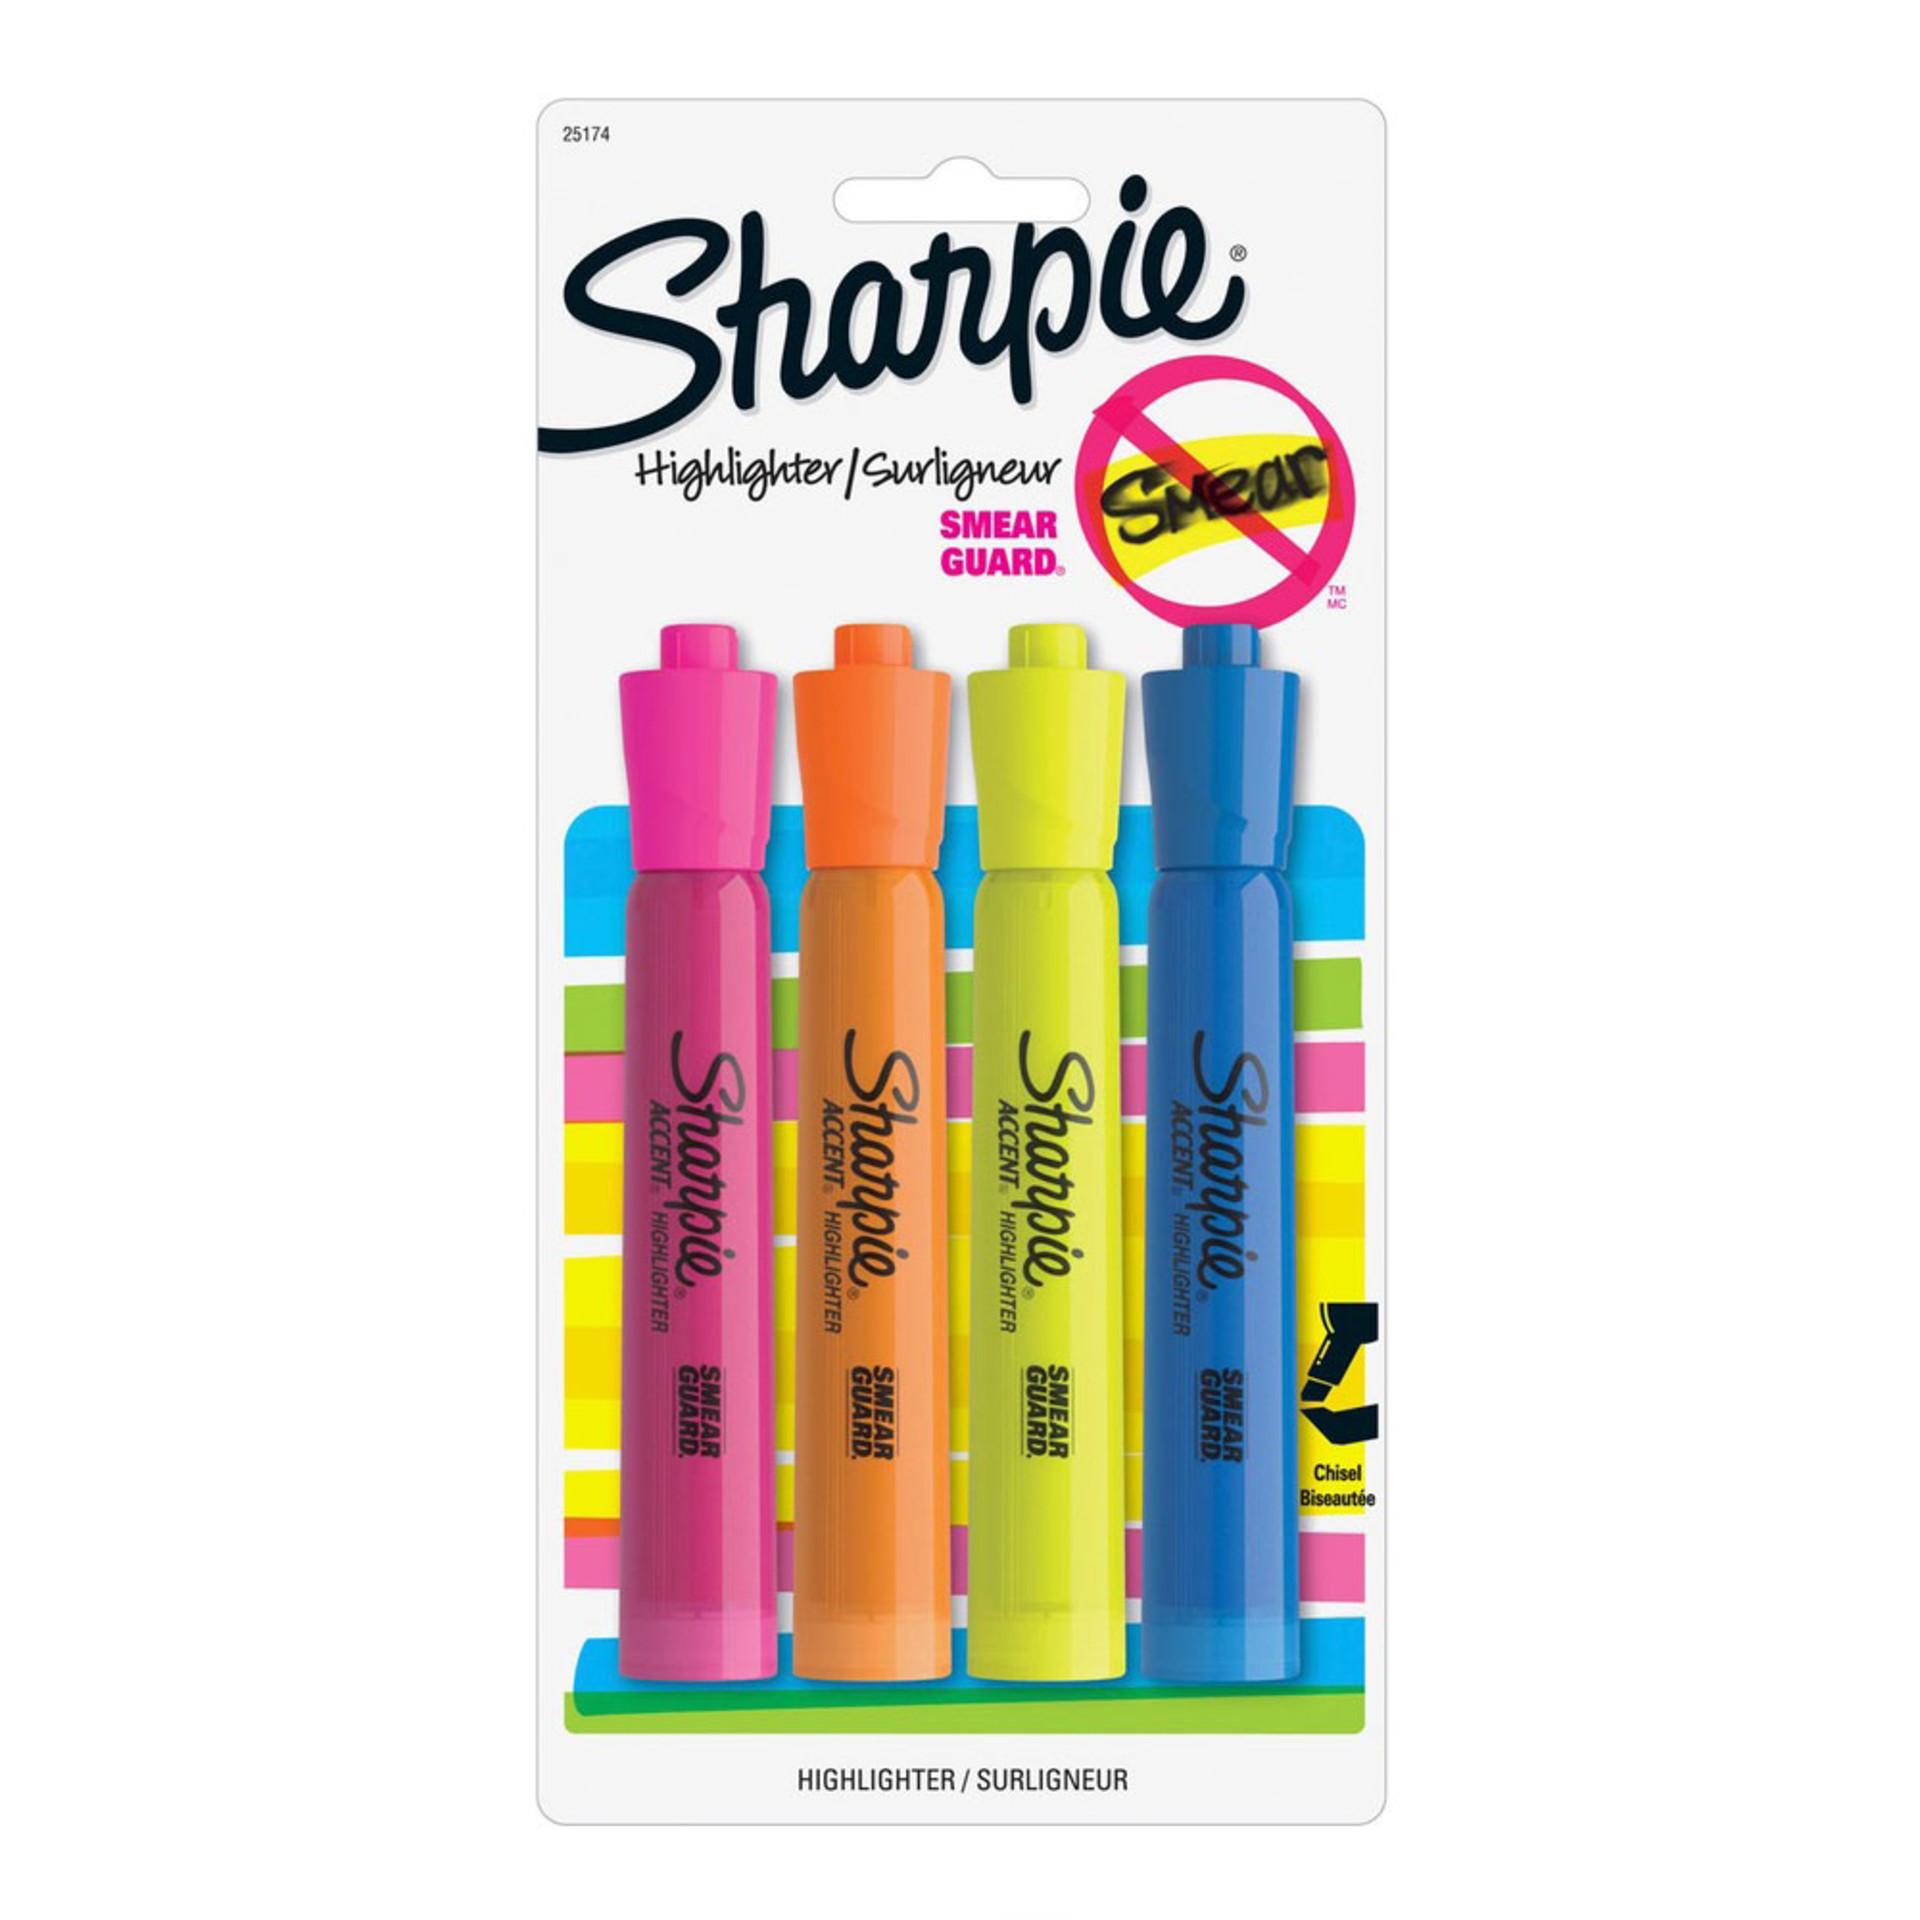 Sharpie Major Accent Highlighter 4 pack